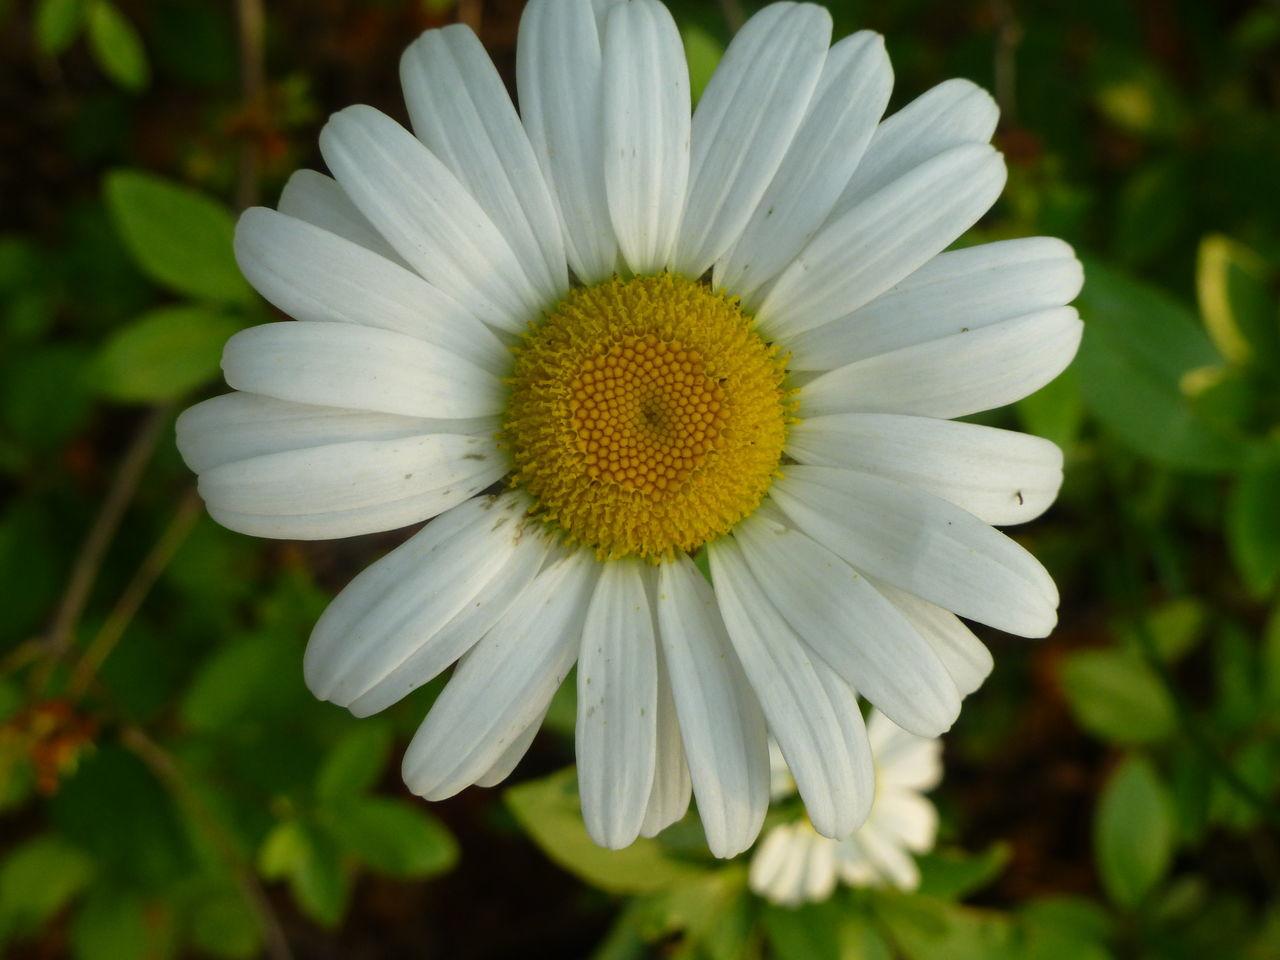 Close-Up Of Fresh Daisy Flower